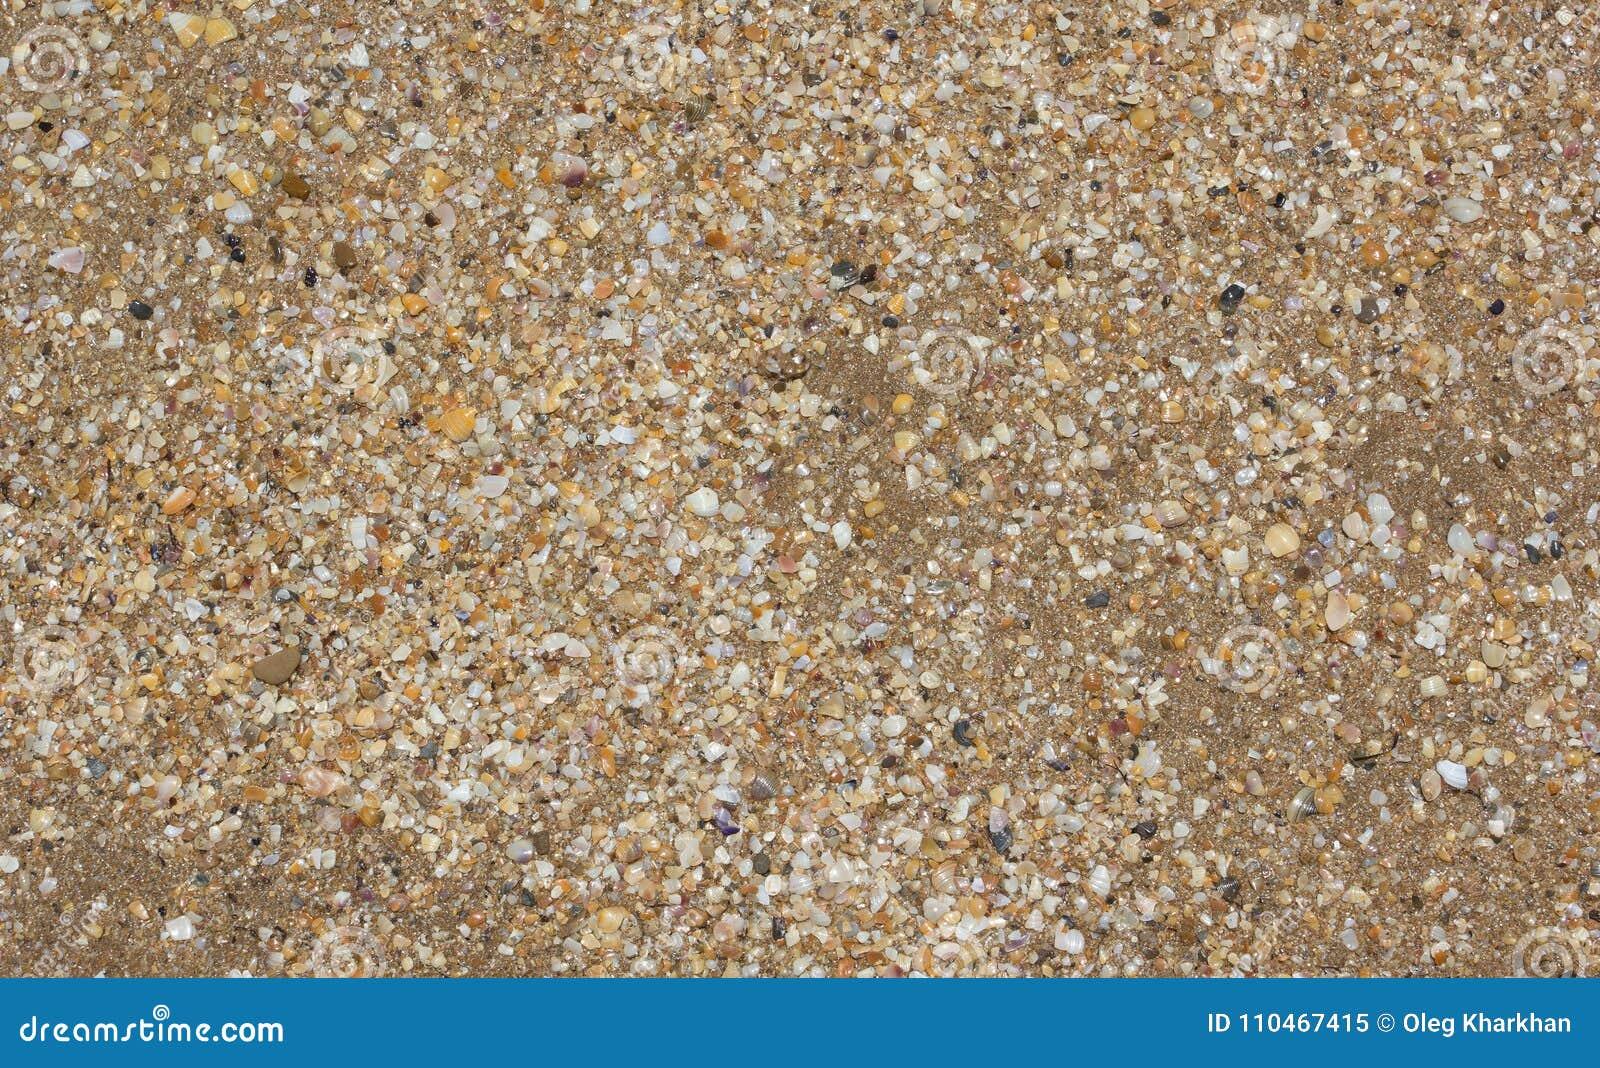 Fond de sable de mer et de coquilles